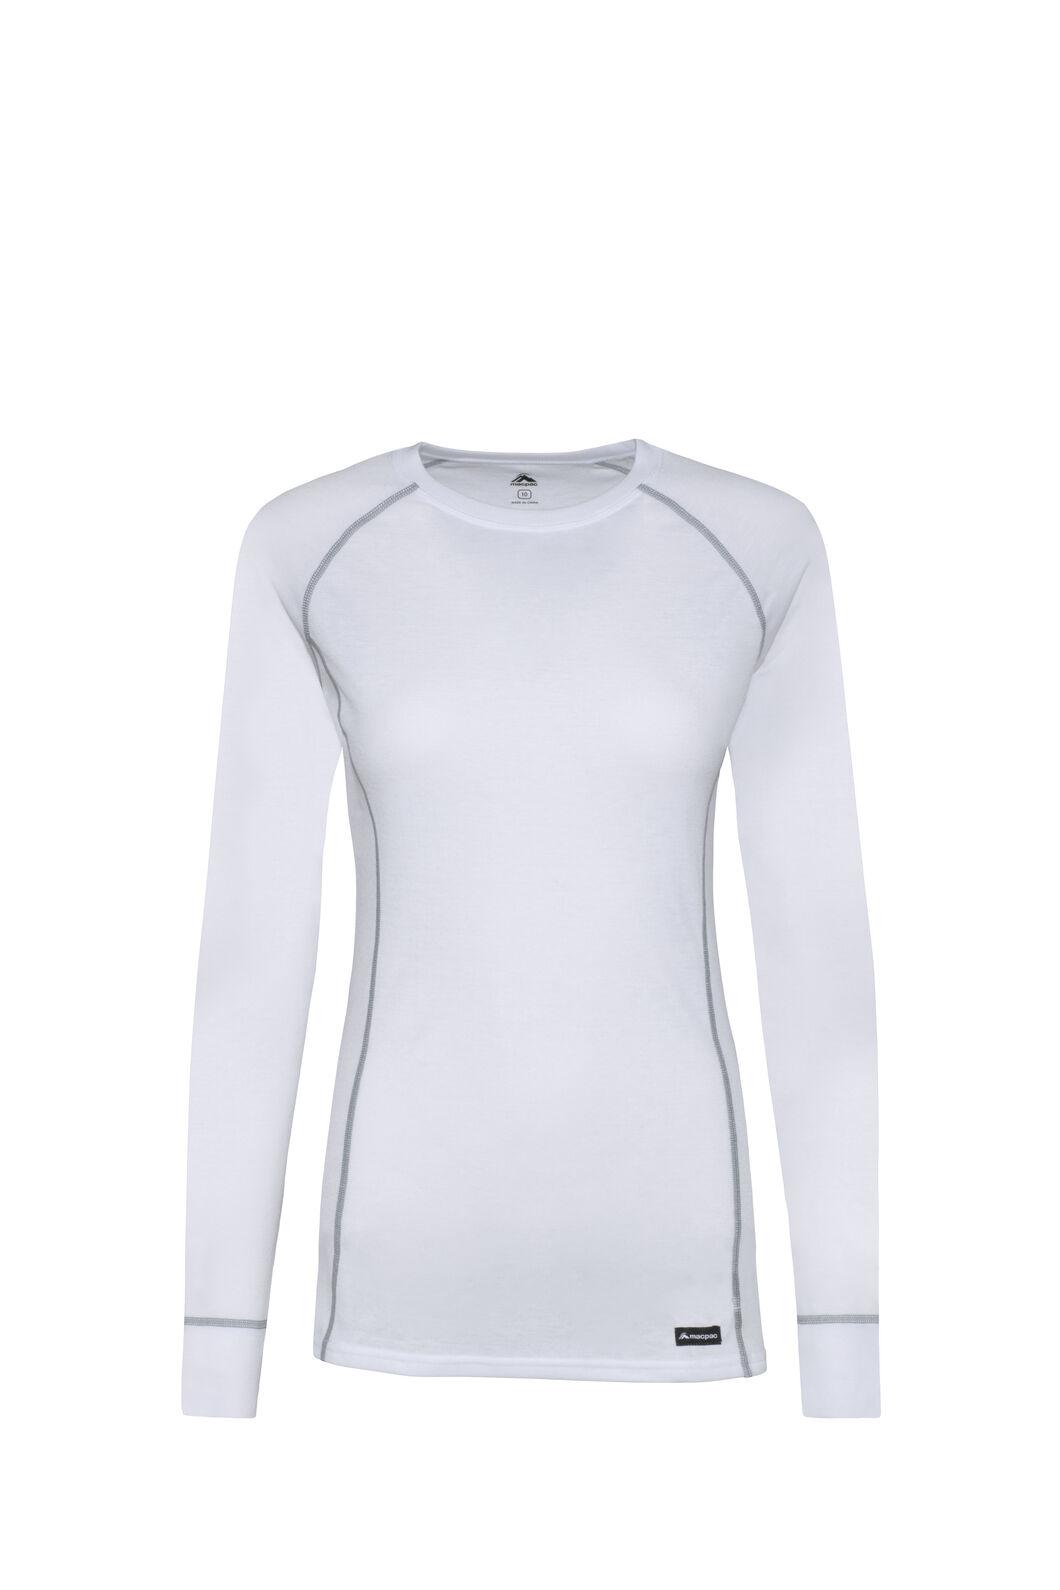 Macpac Geothermal Long Sleeve Top — Women's, White/White, hi-res